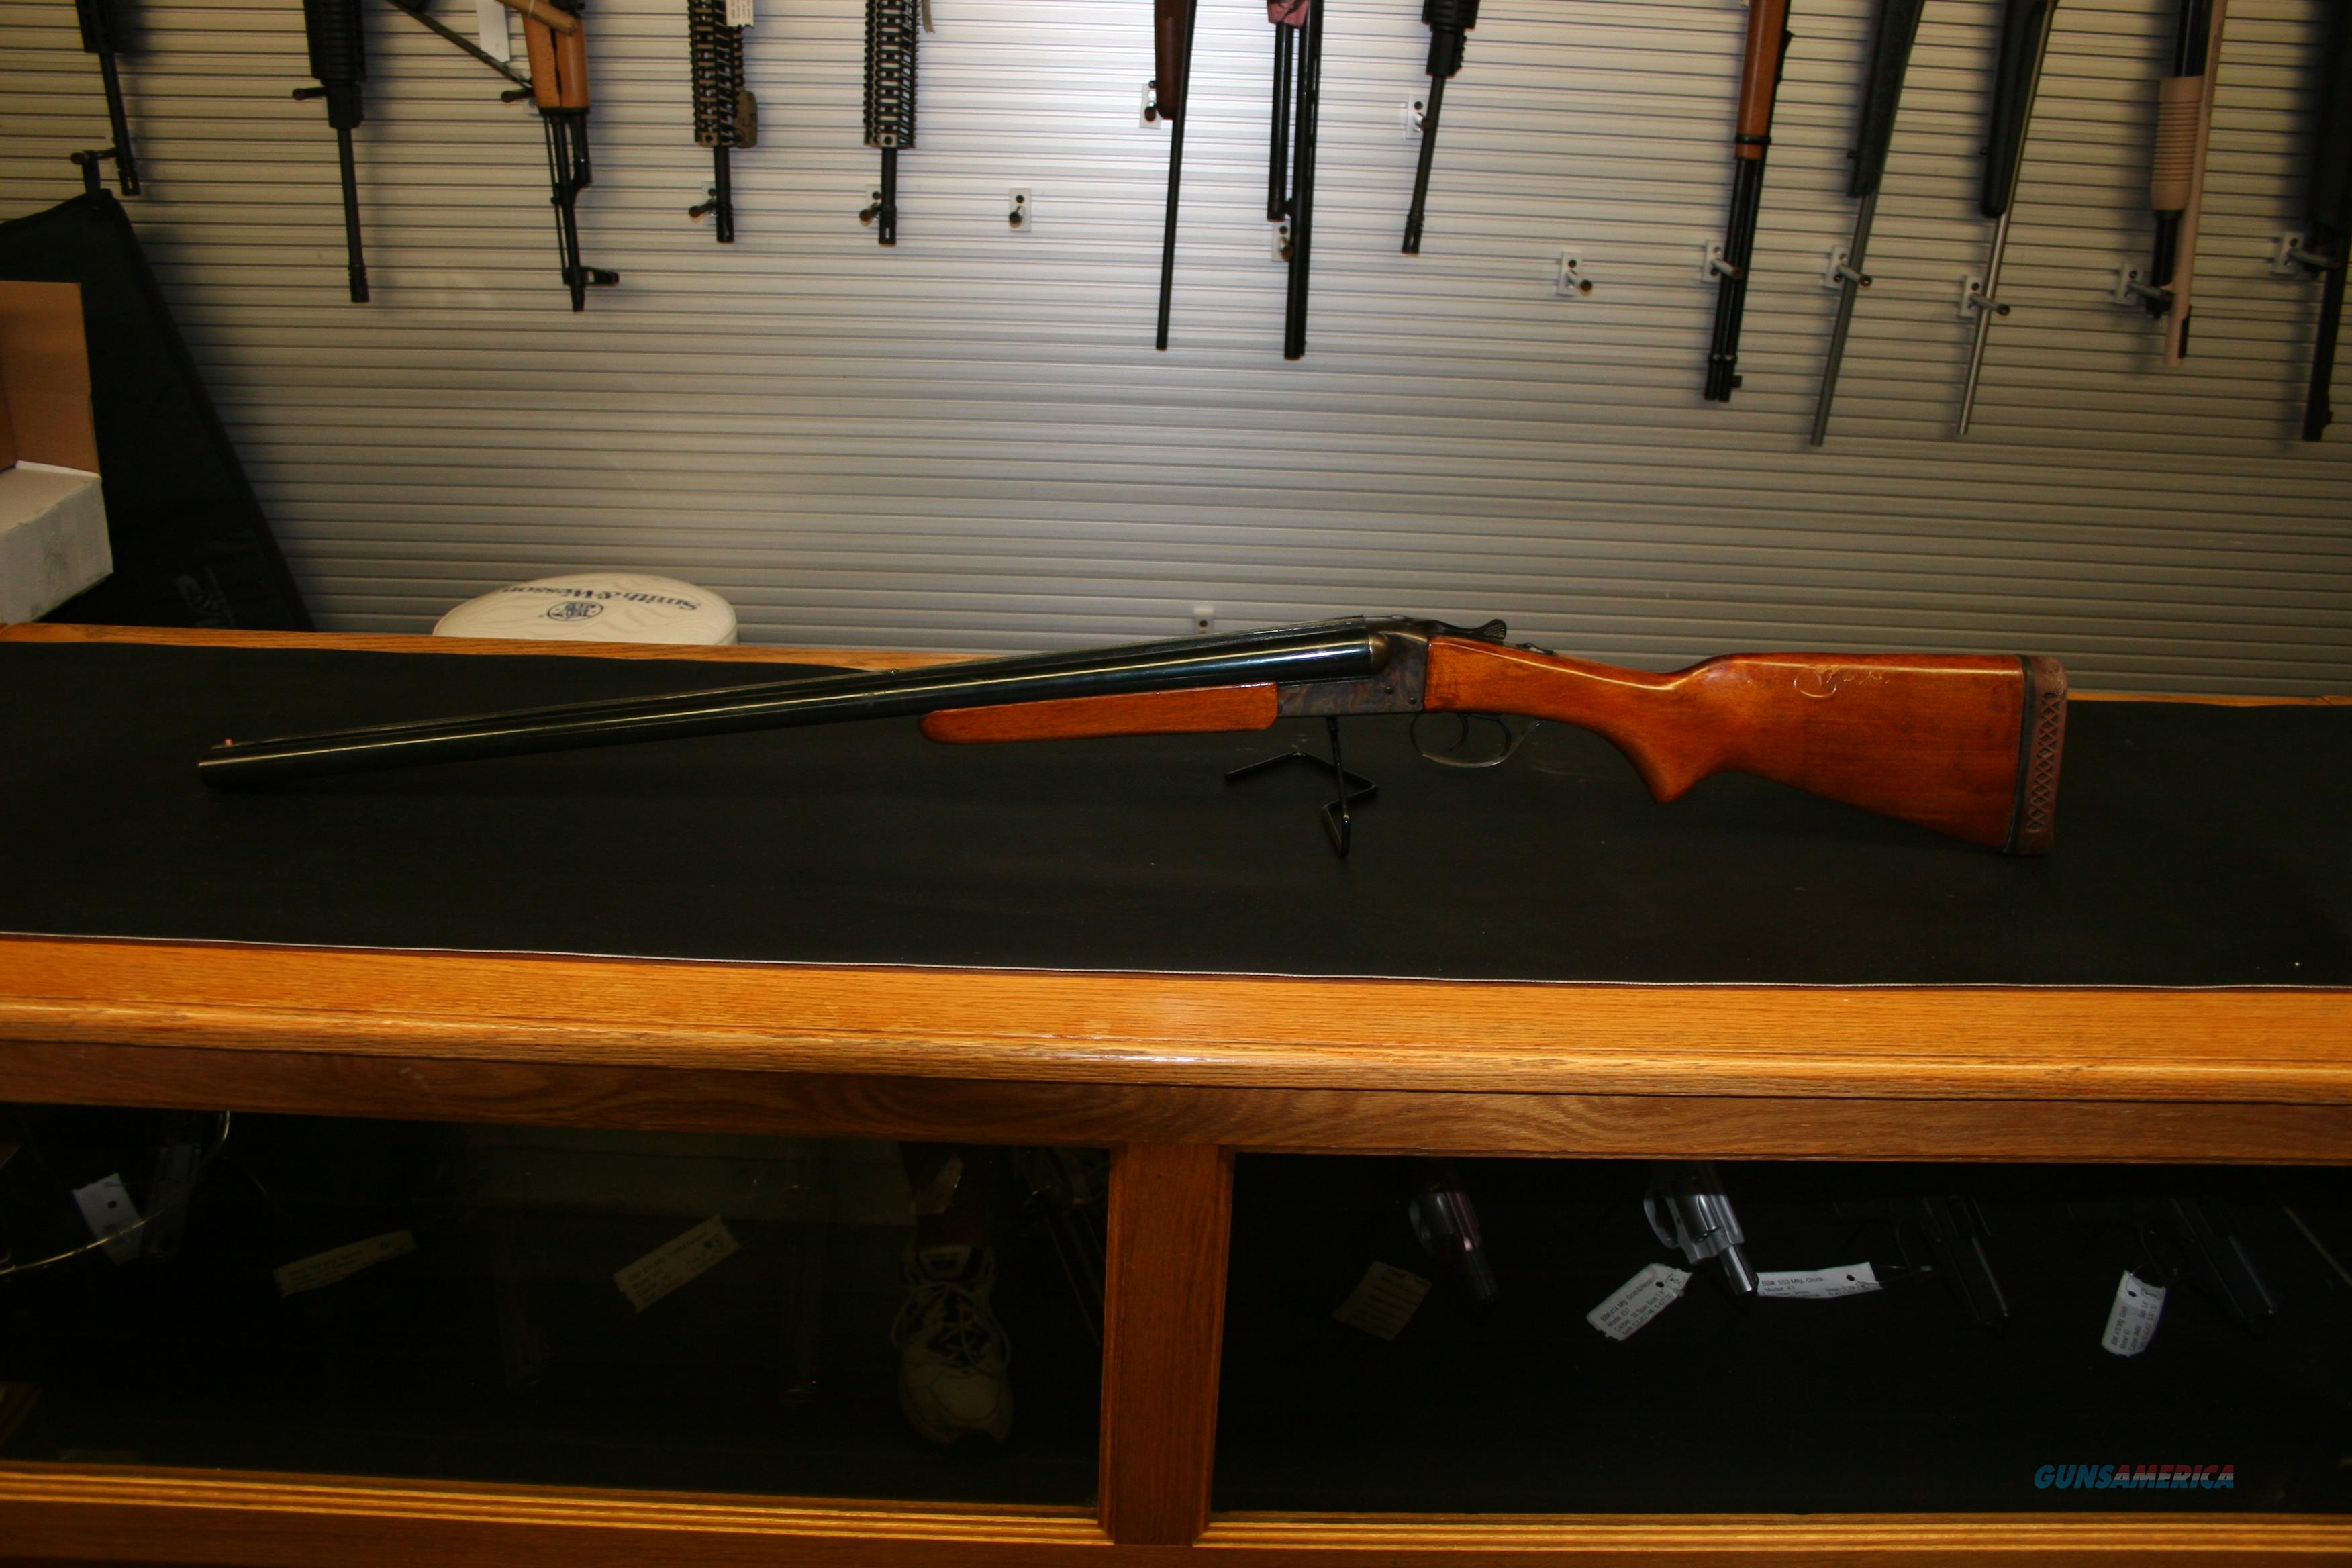 Savage-Springfield Model 511 12 Gauge SxS Shotgun  Guns > Shotguns > Savage Shotguns